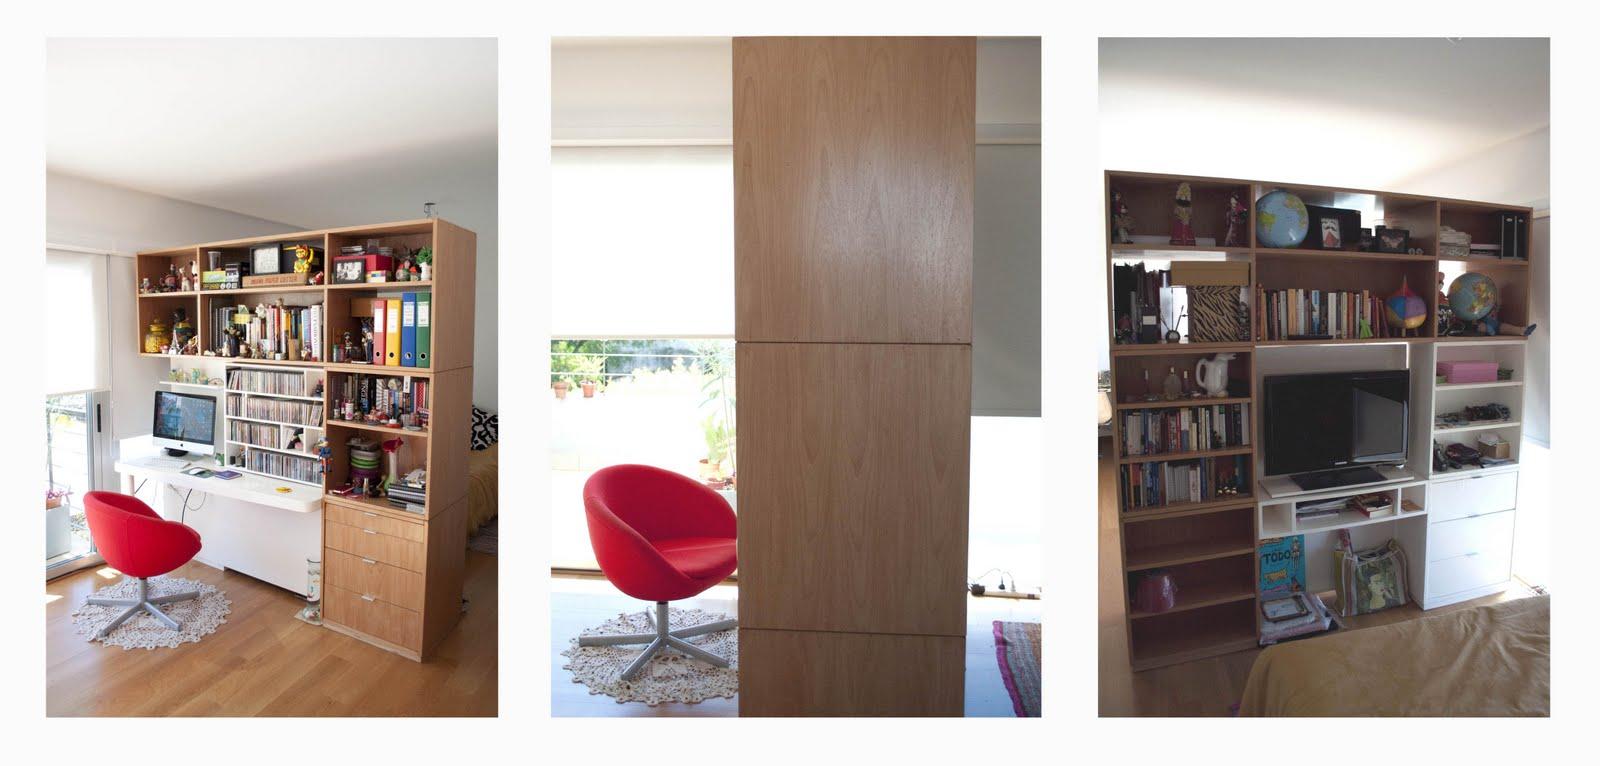 Juan ignacio rentero mueble divisor - Mueble giratorio para tv ...